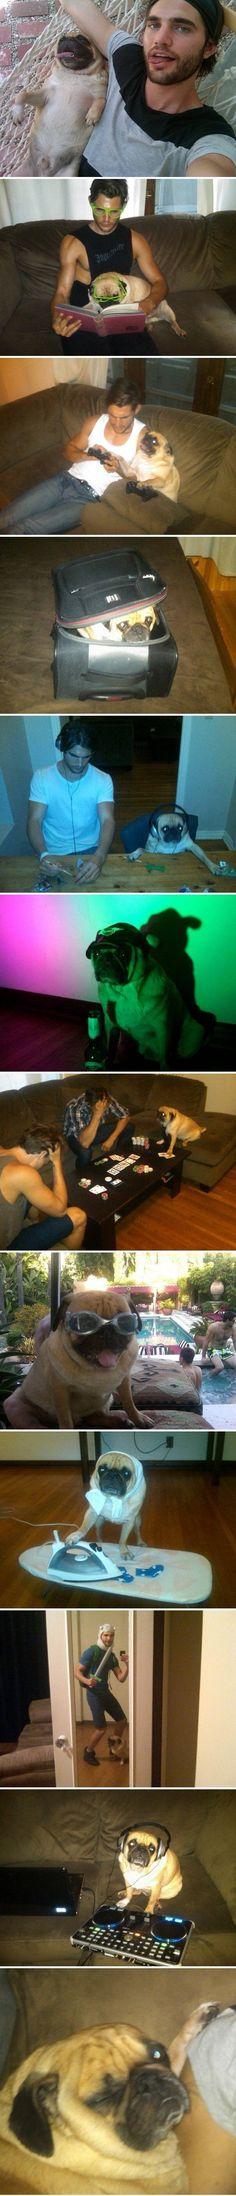 funny-photogenic-pug